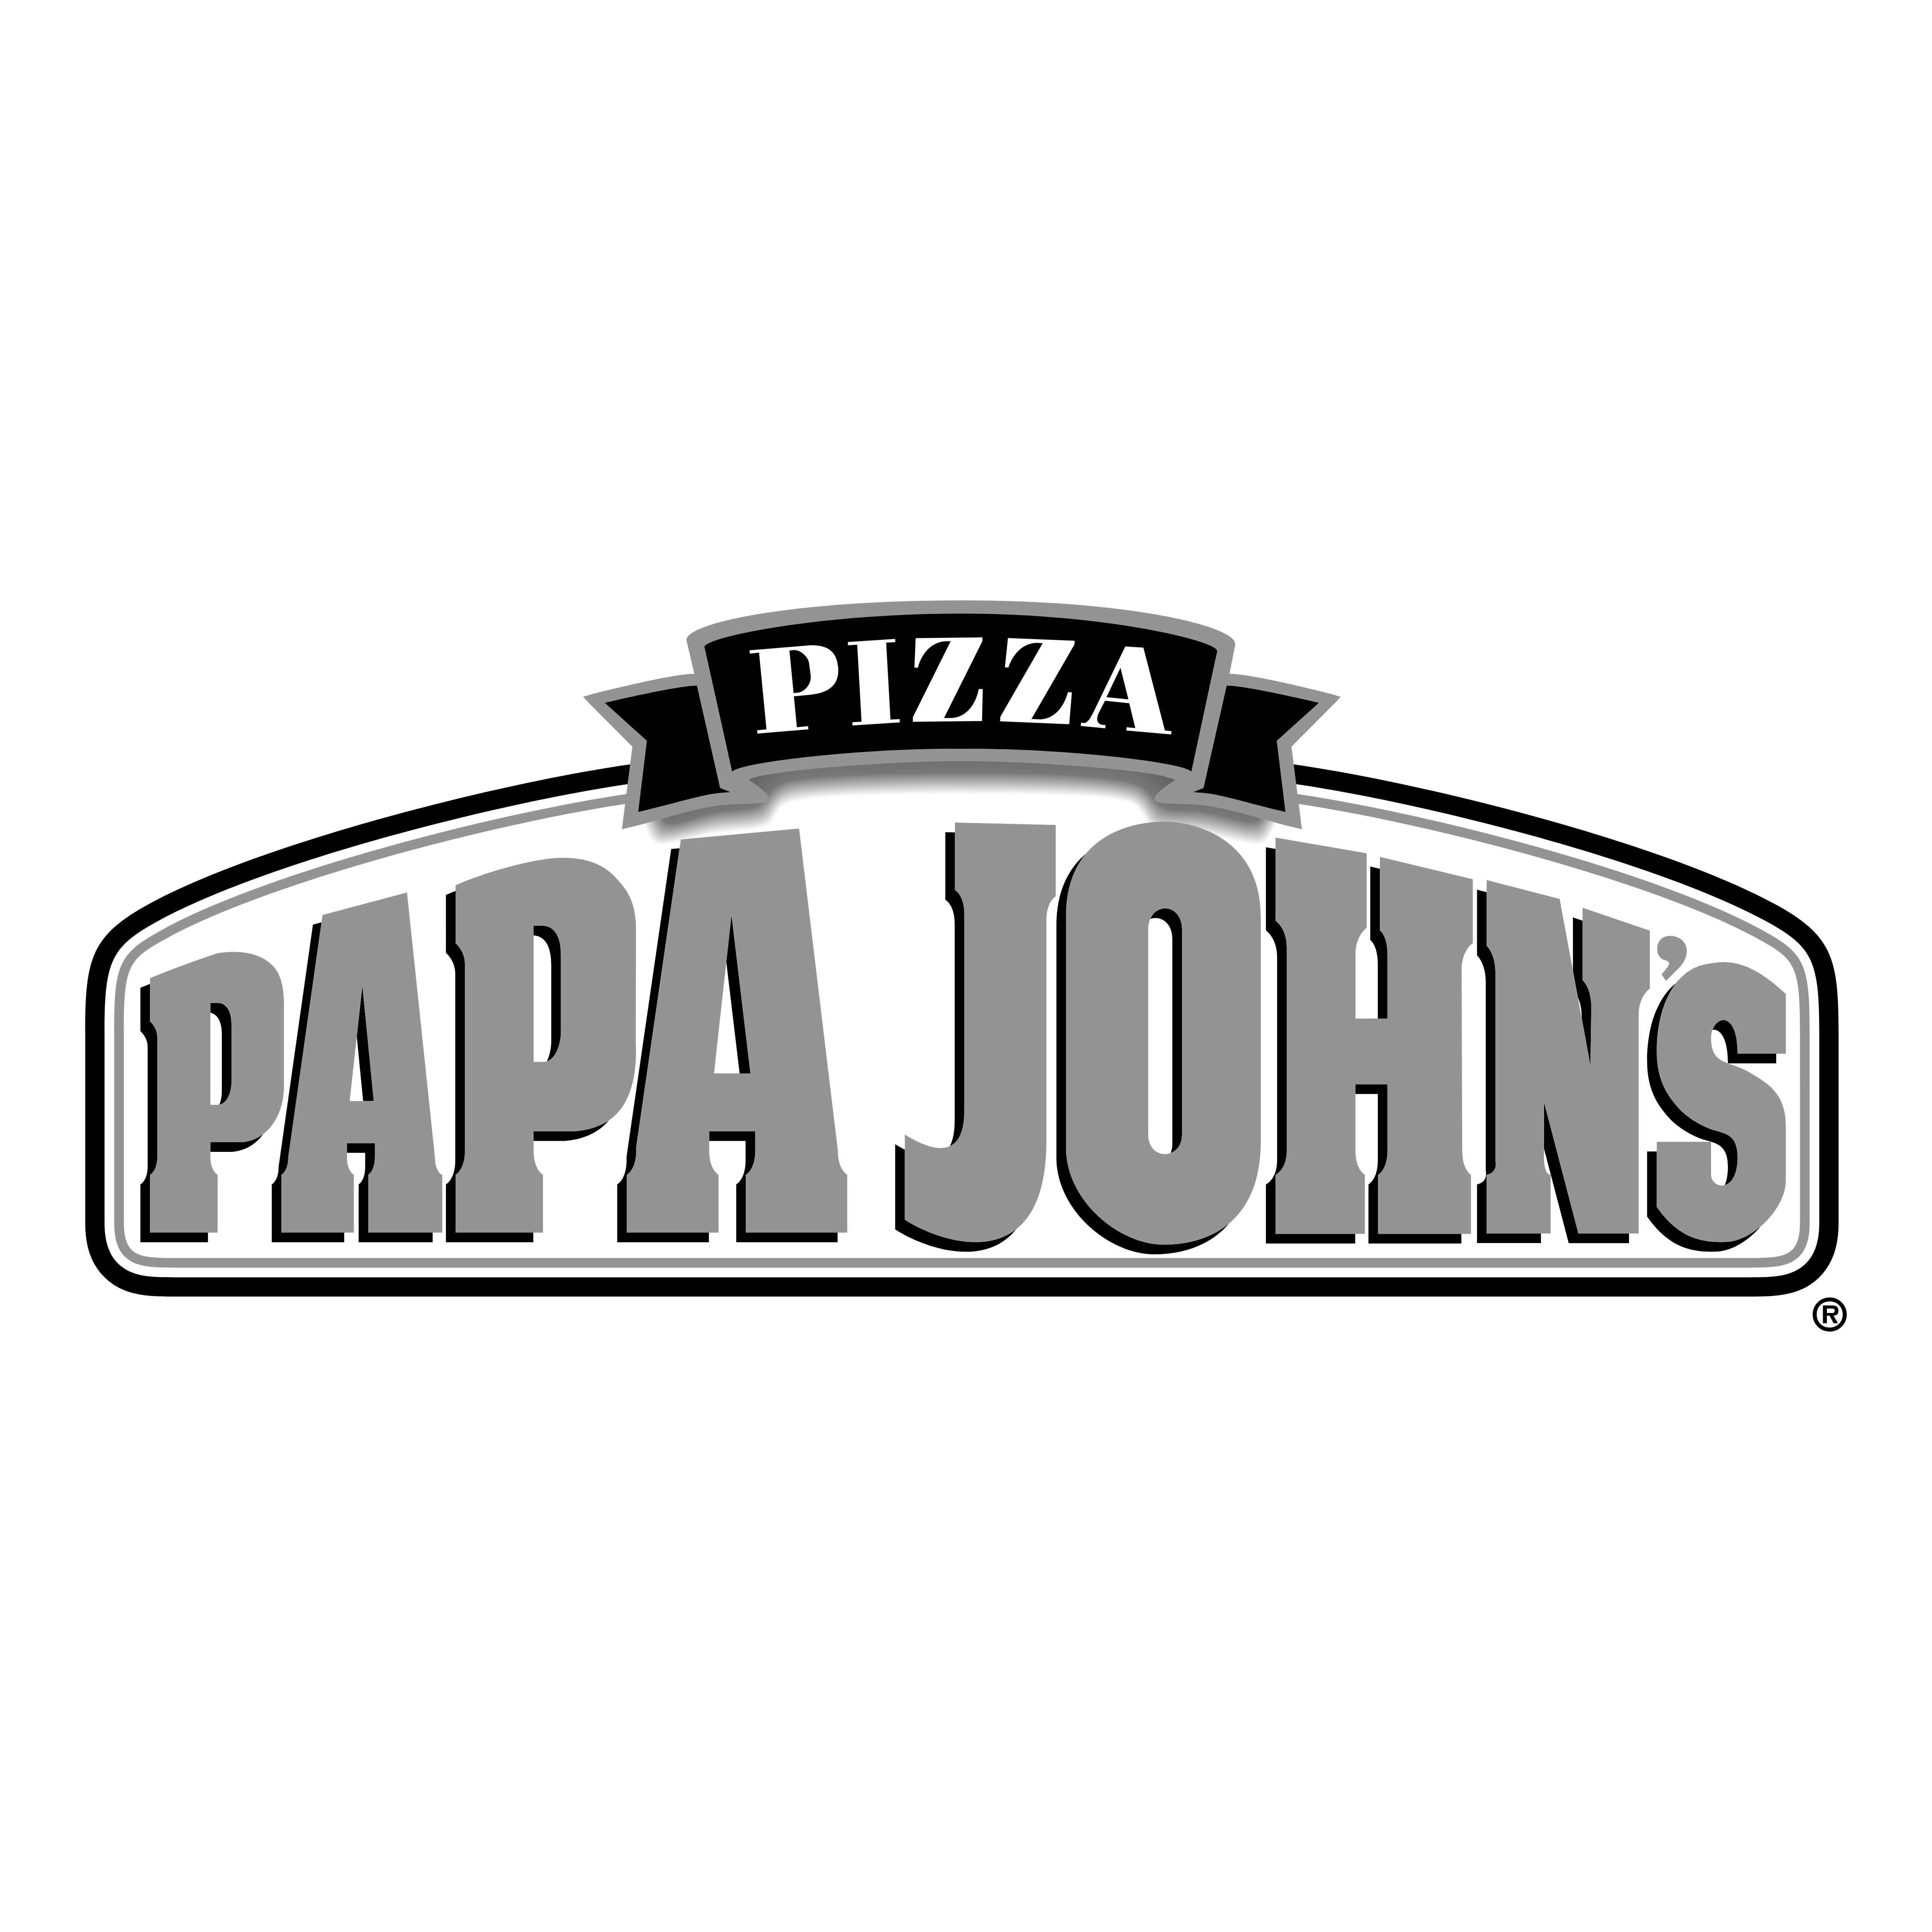 John S Pizza Cafe